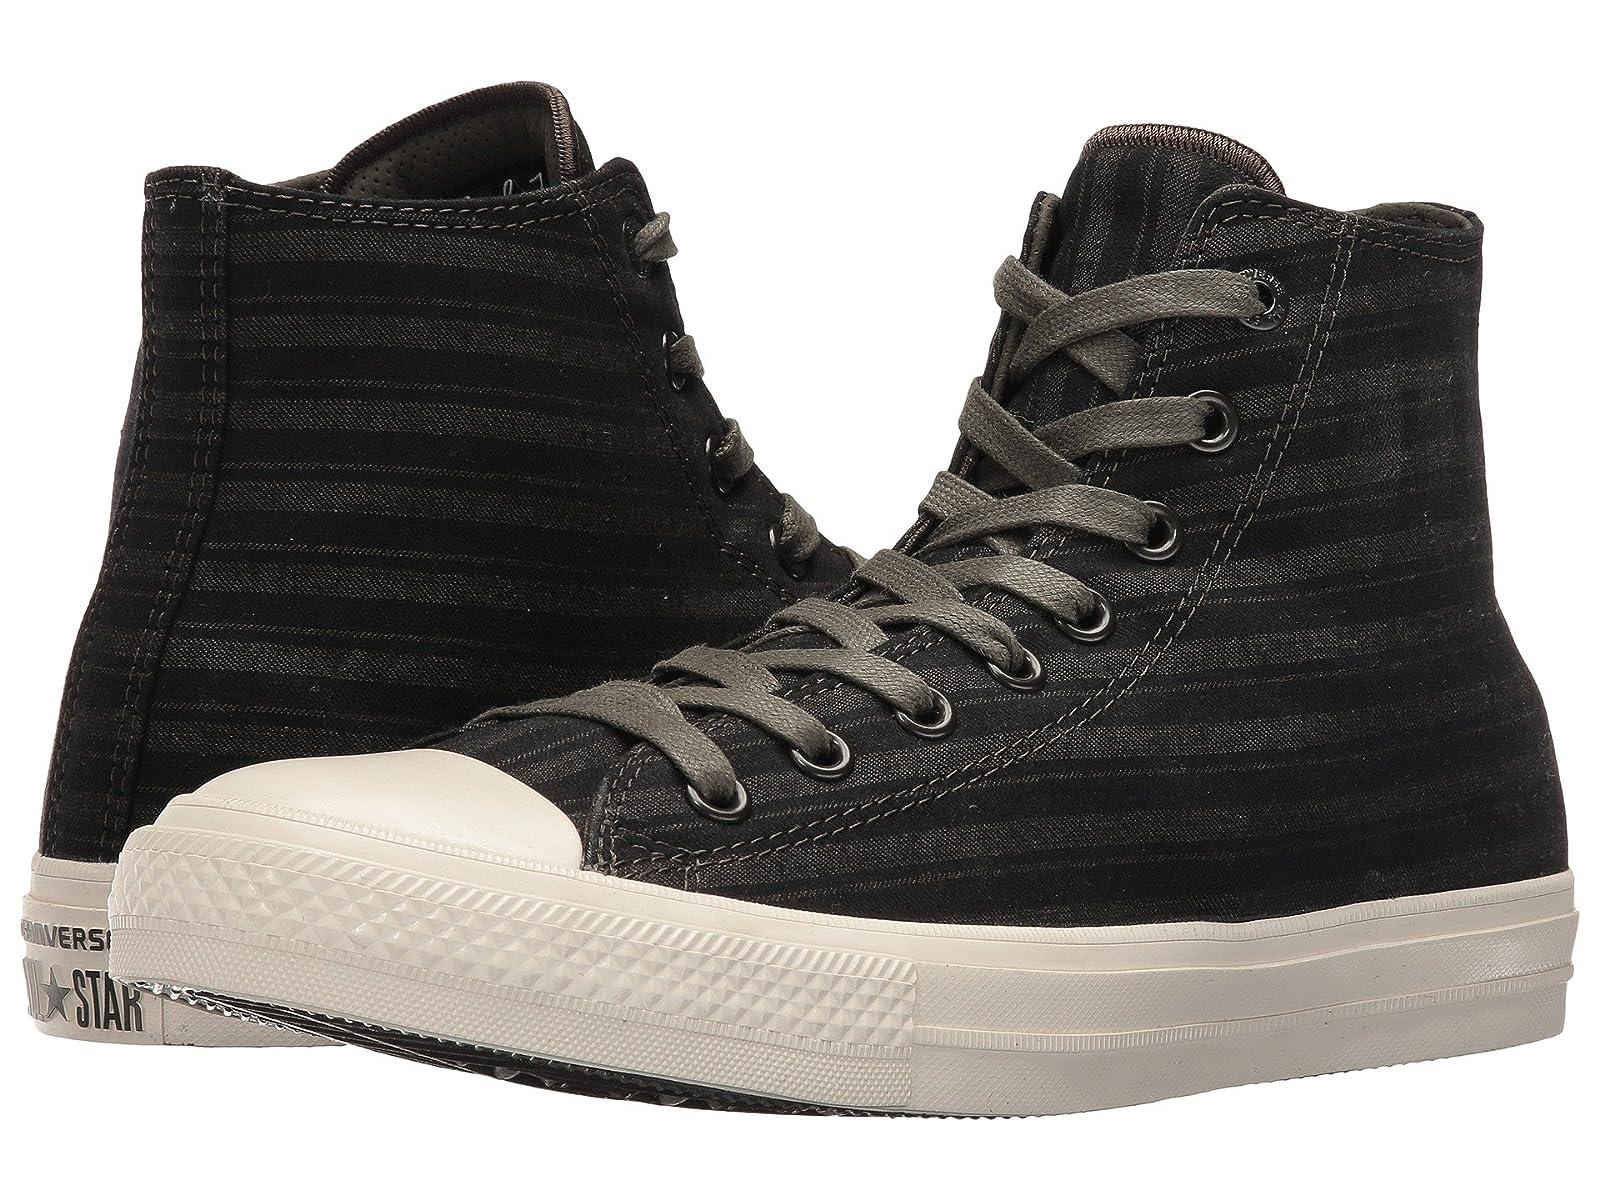 Converse by John Varvatos Chuck Taylor All Star II Hi TextileCheap and distinctive eye-catching shoes